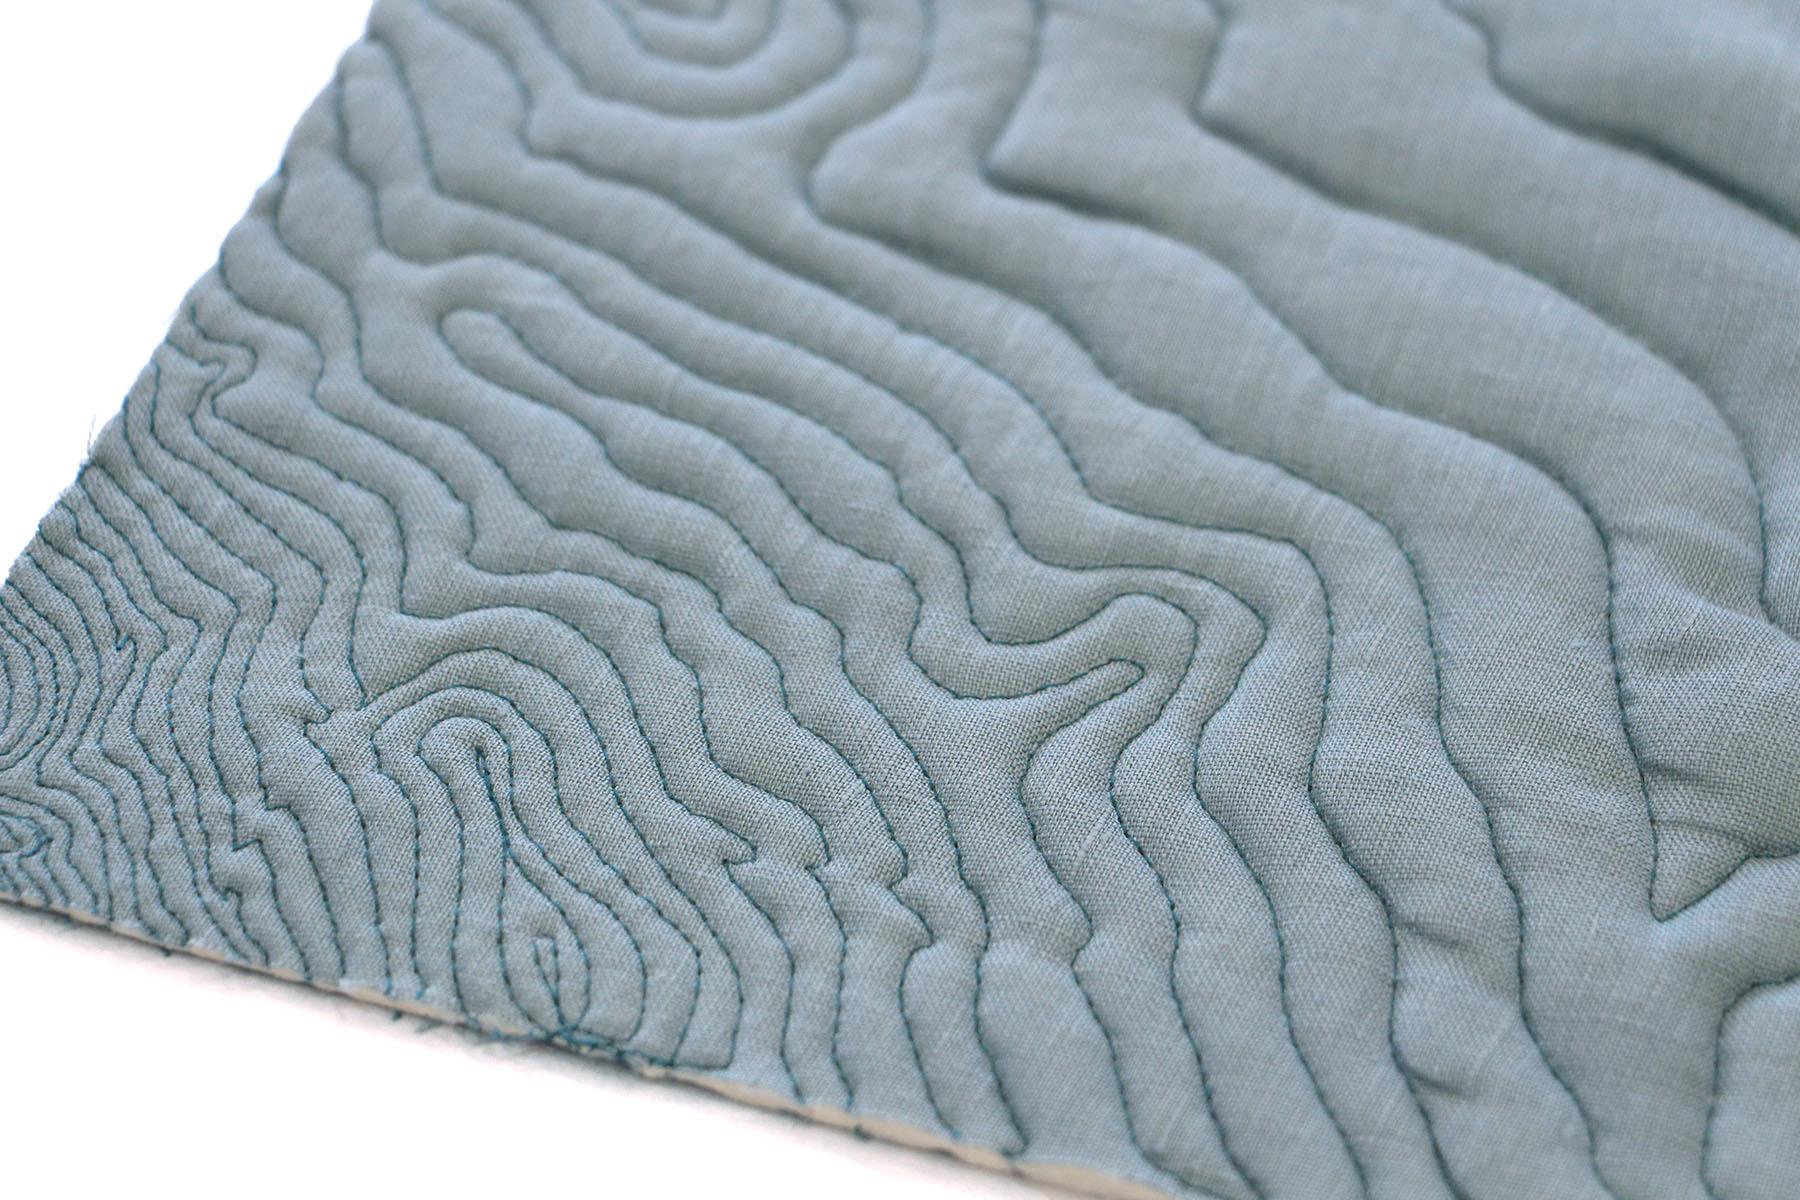 Megan Nielsen Patterns | Hovea Sewalong: Machine Quilting | Free Motion Stitching